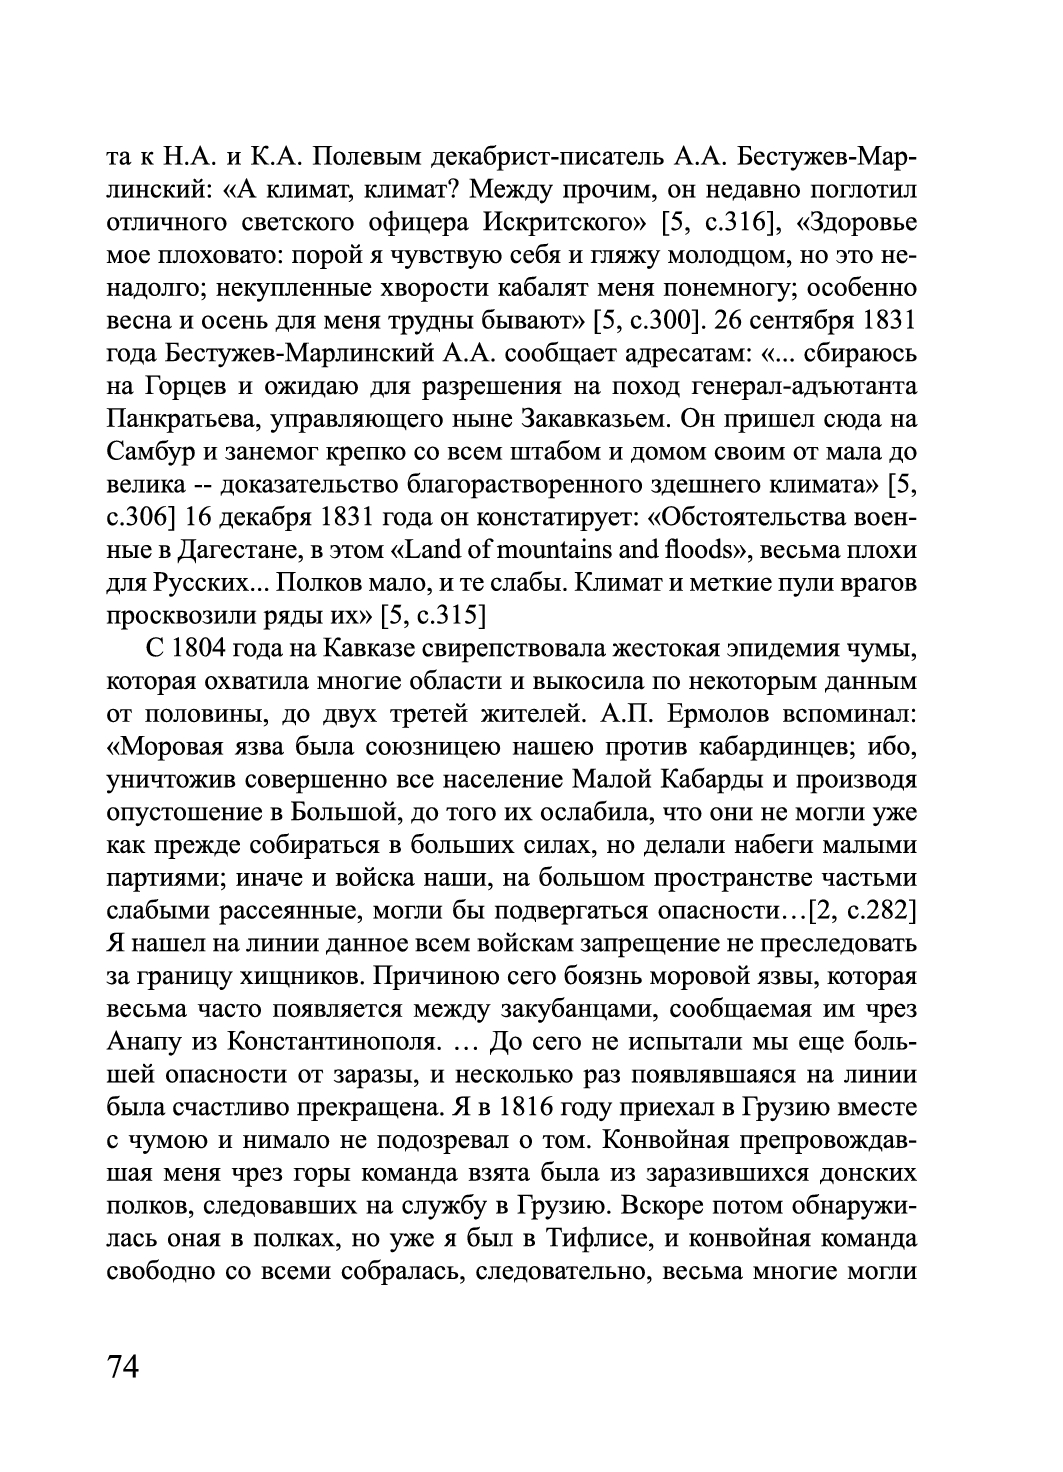 http://forumupload.ru/uploads/001a/7d/26/3/96275.jpg